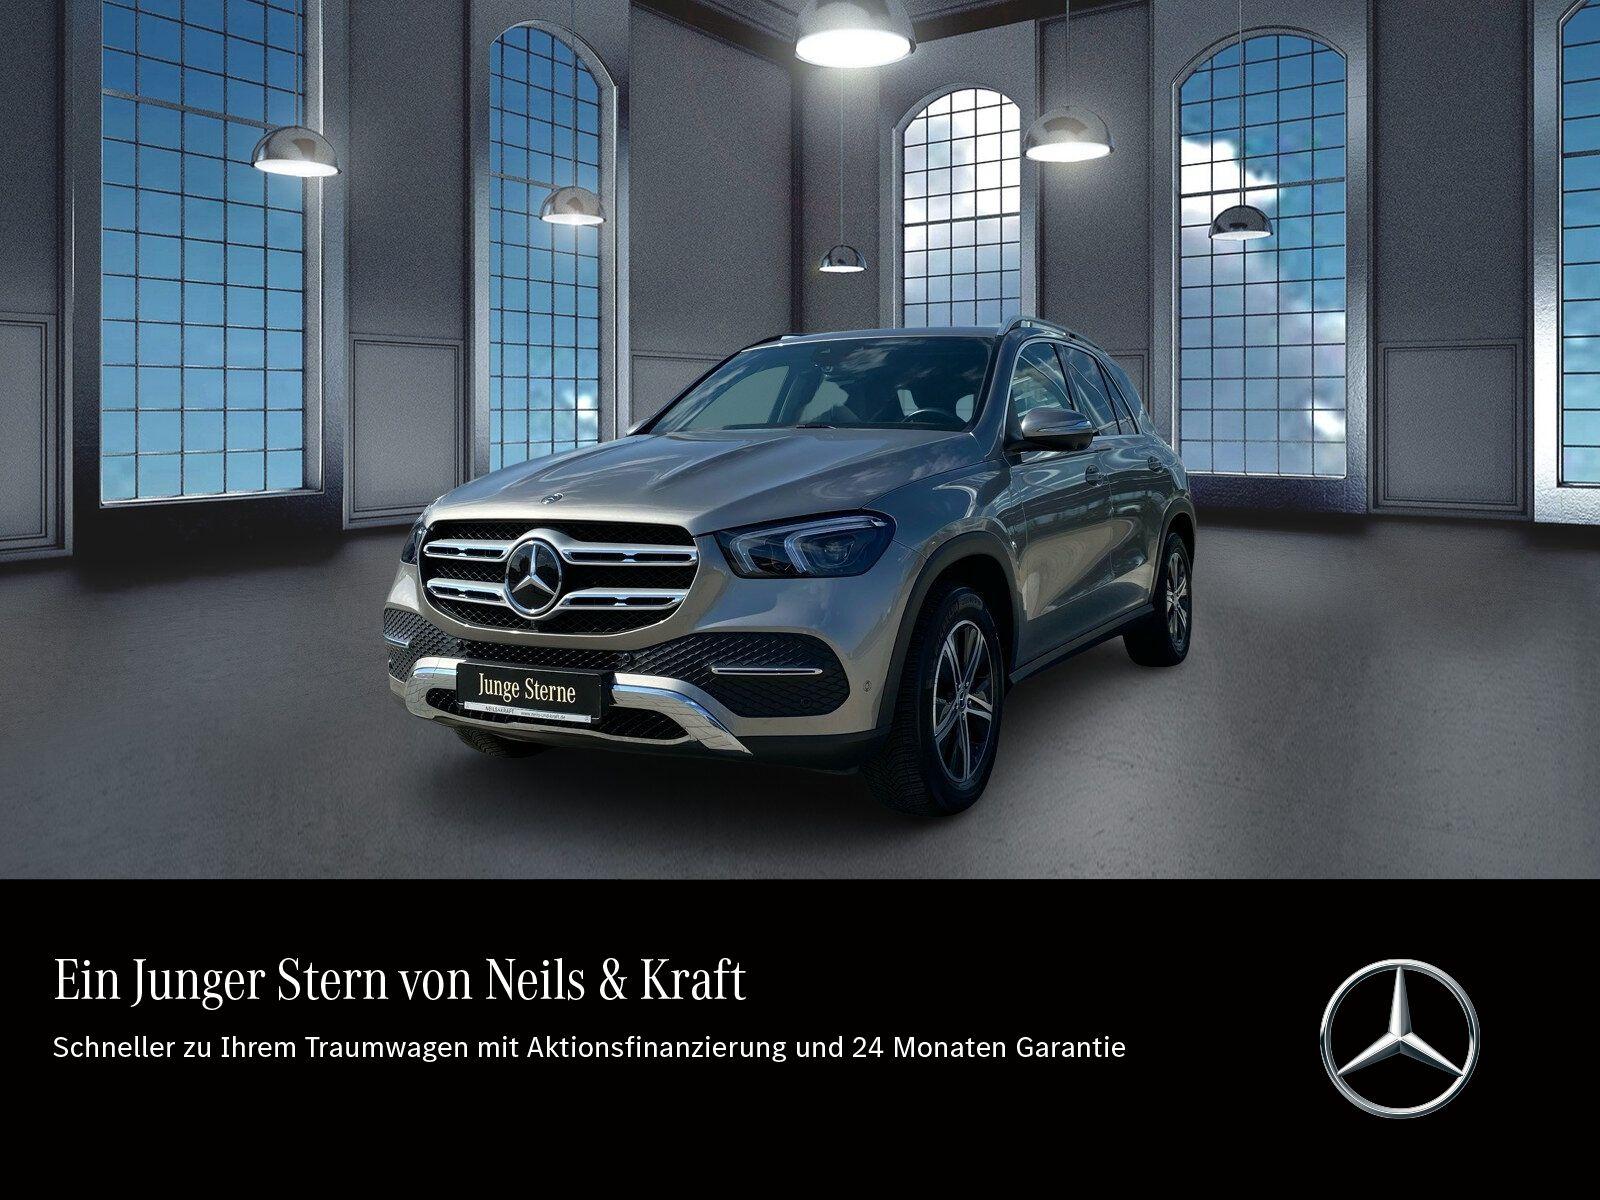 Mercedes-Benz GLE 300d AHK+FAHRASS+AMBI+CARPLAY+BURMEST.+360°+, Jahr 2020, Diesel